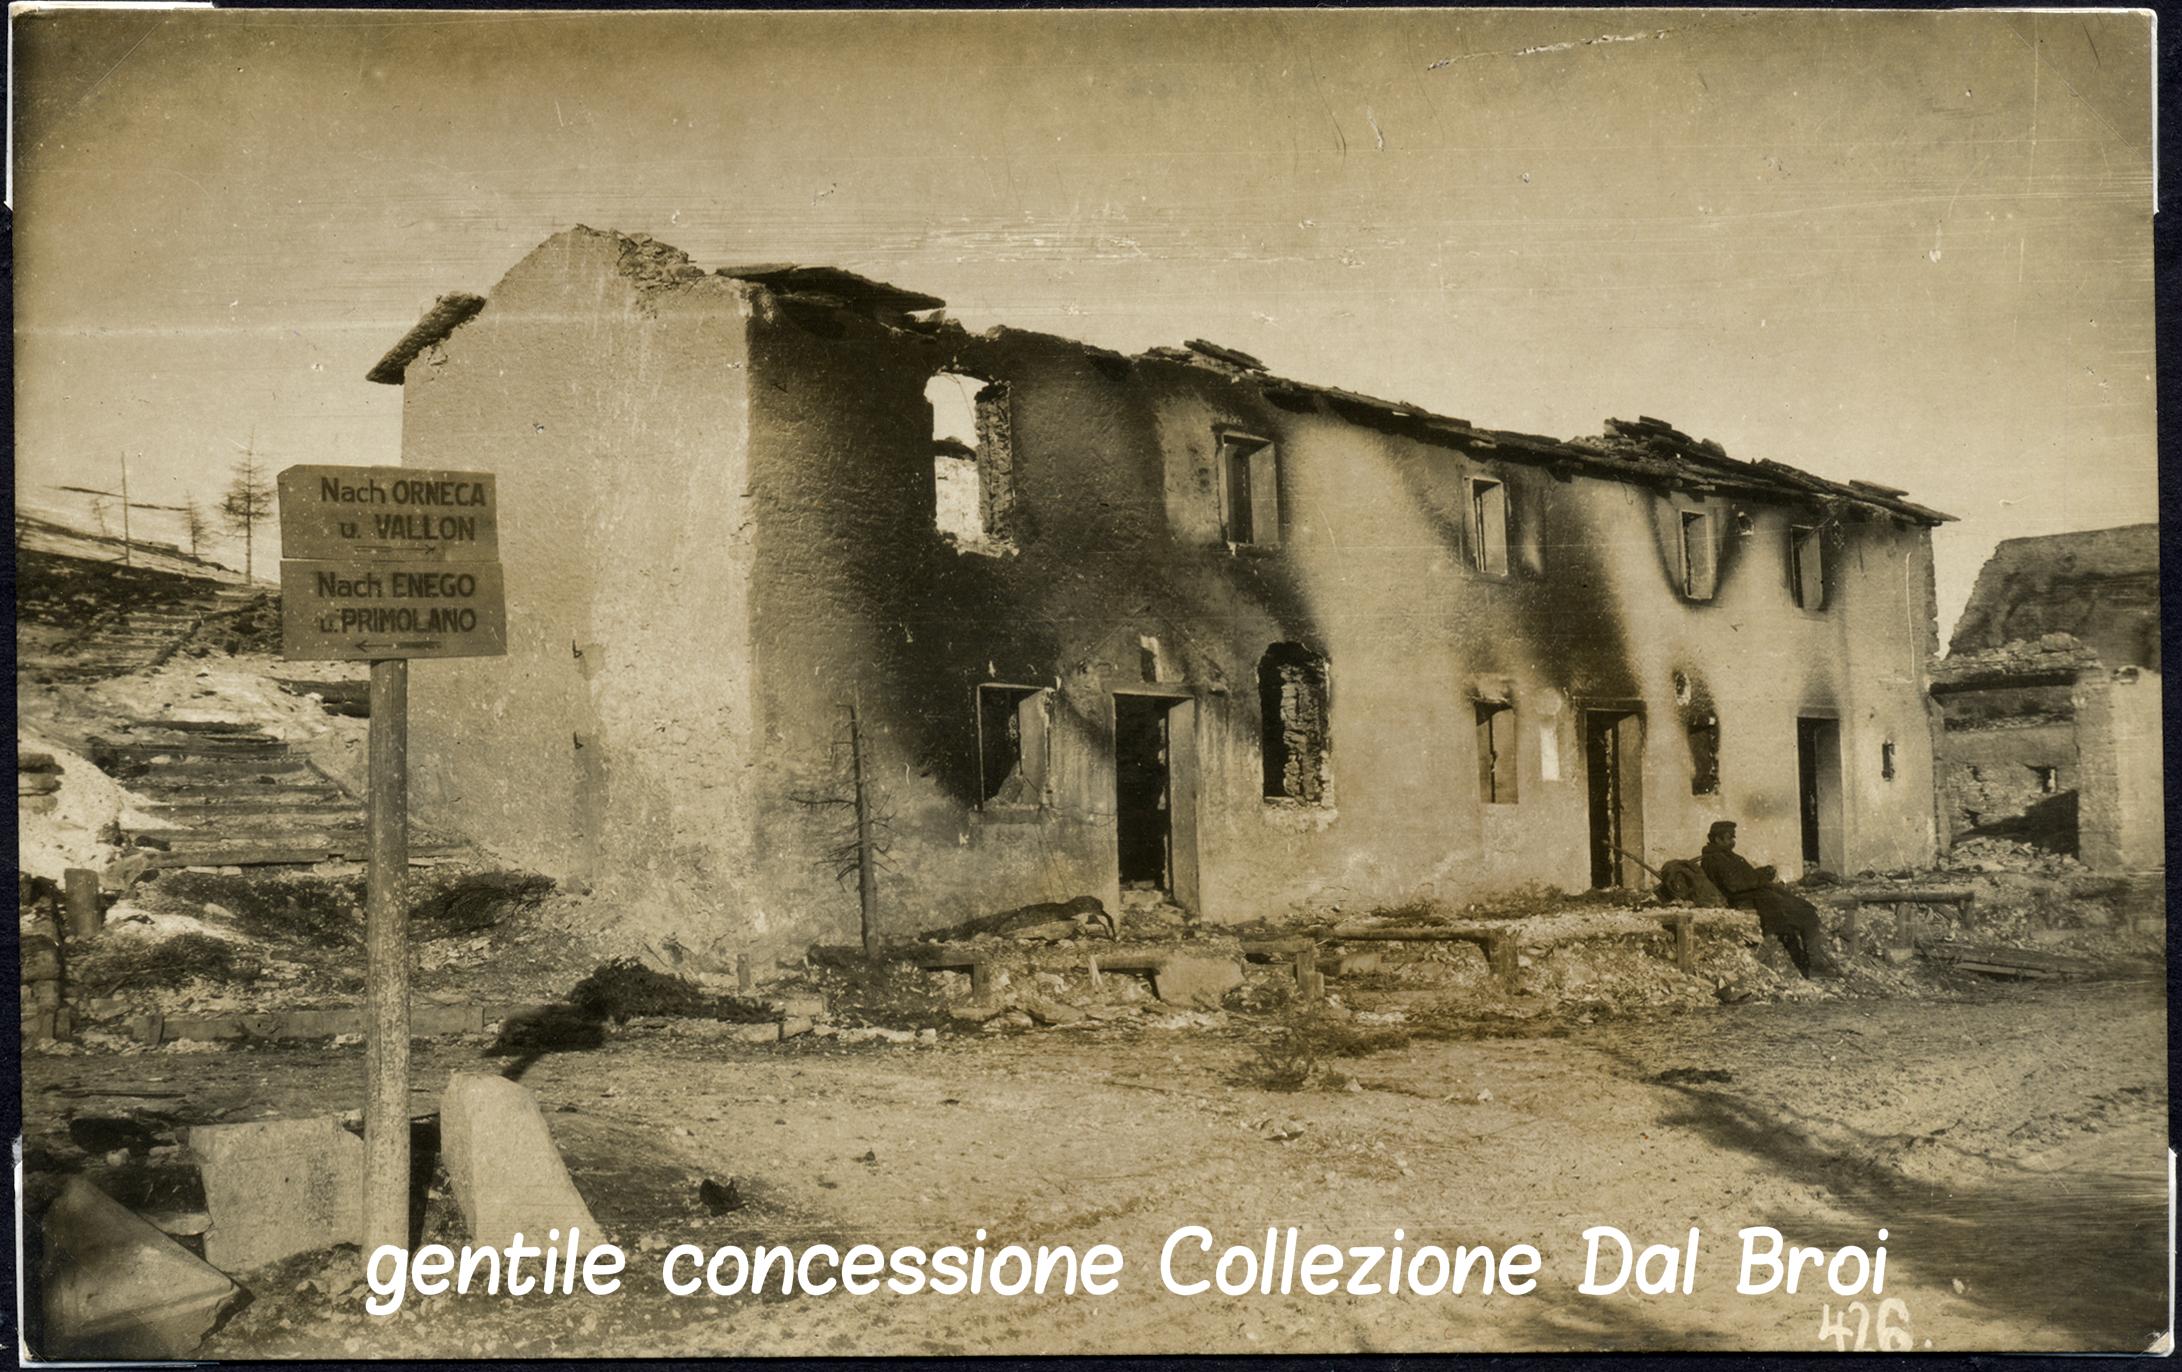 10 - case distrutte  in località Orneca - (ASDM - coll dal broi) (c).jpg